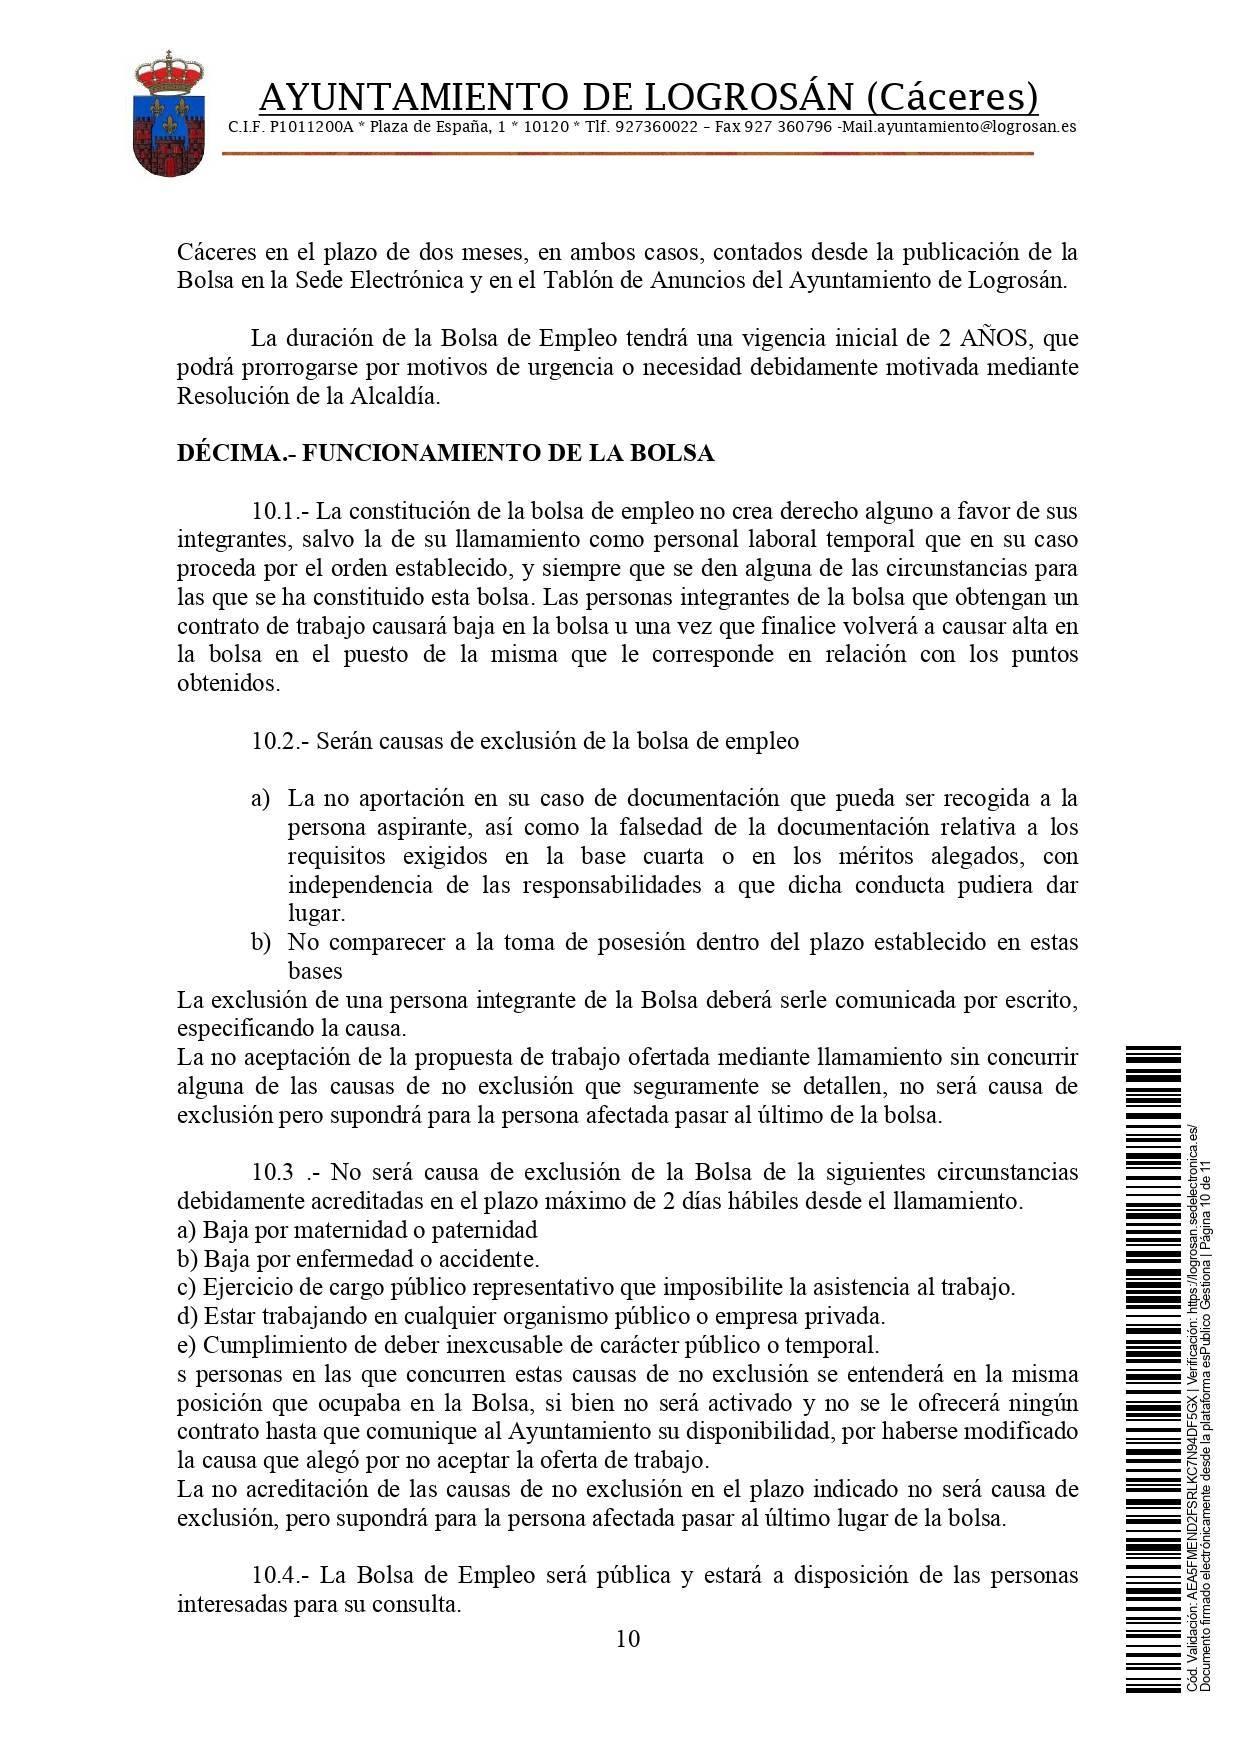 Bolsa de técnicos-as en educación infantil (2021) - Logrosán (Cáceres) 10